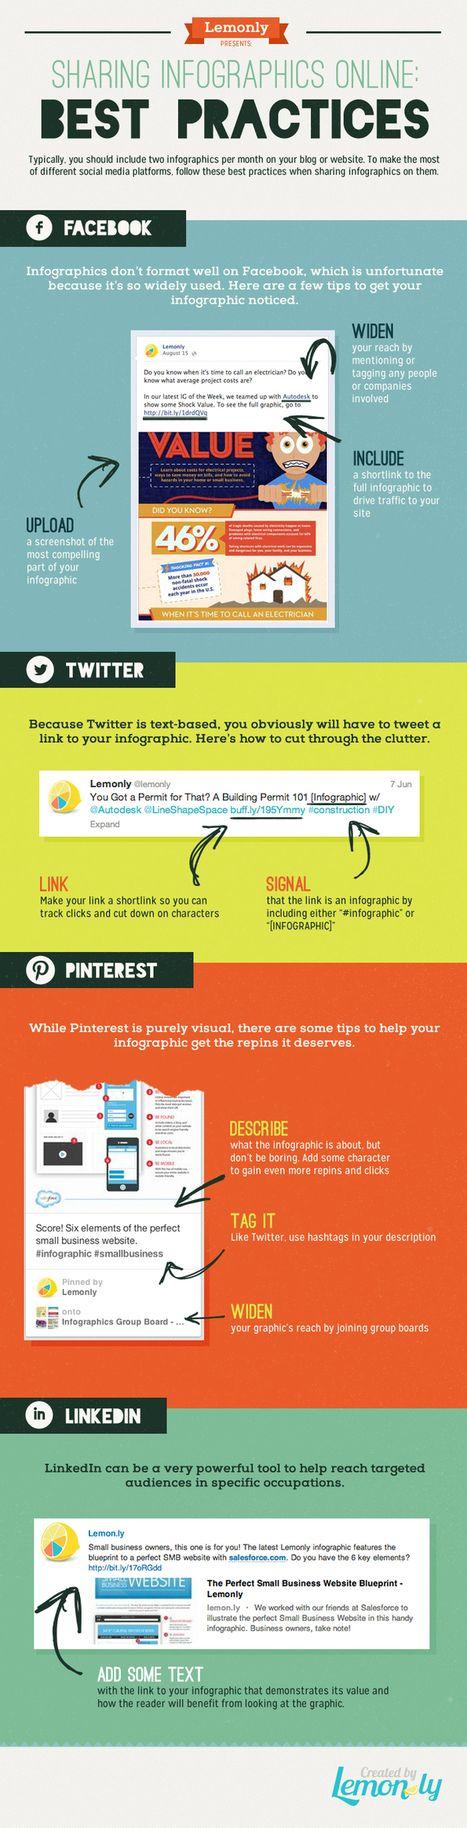 Social Media Best Practices for Infographics | visualizing #socialmediatips